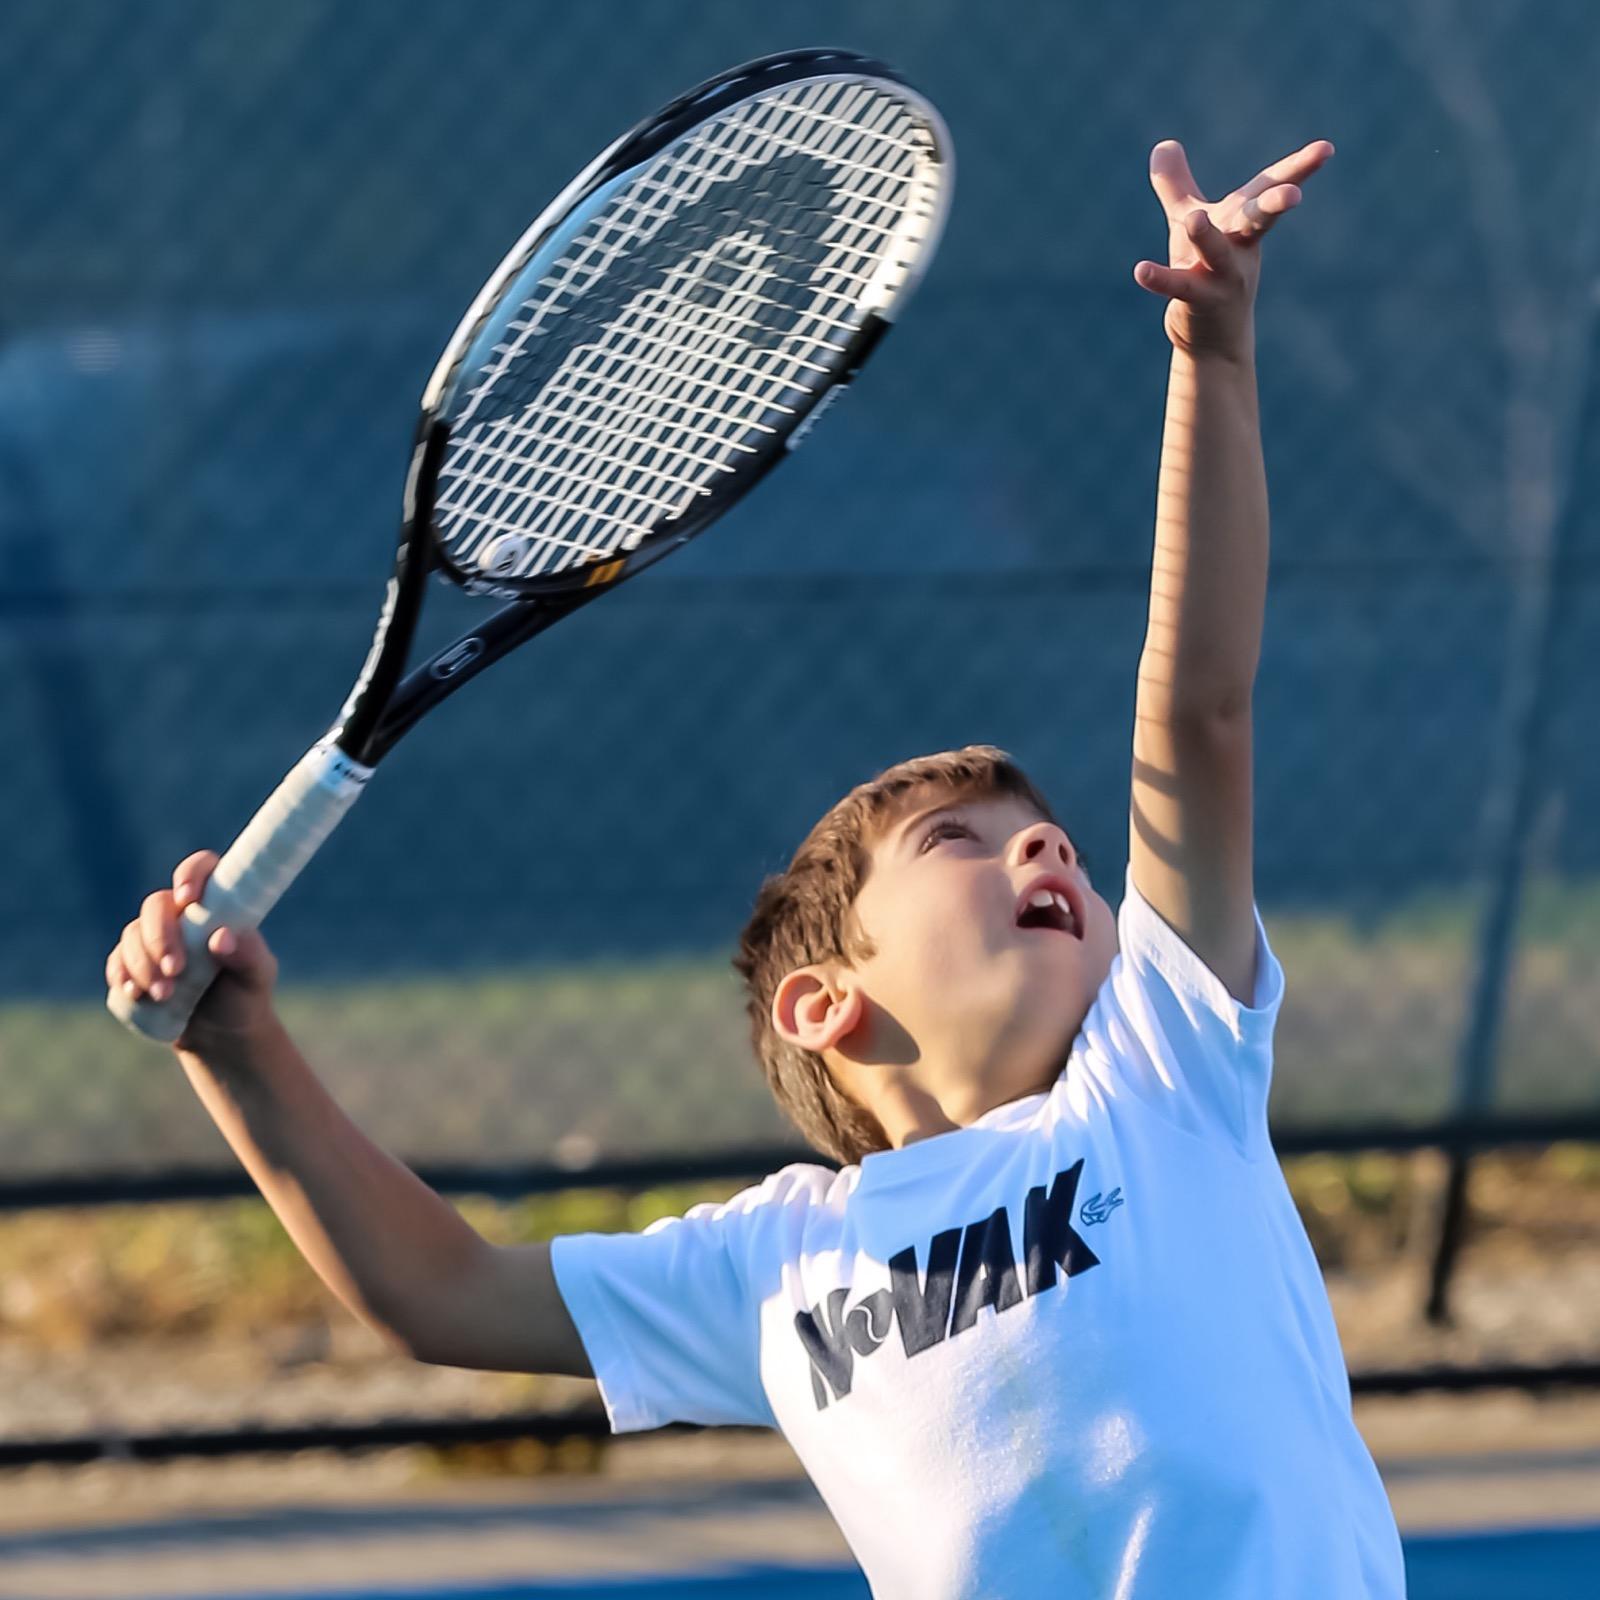 Novak_tennis_serve